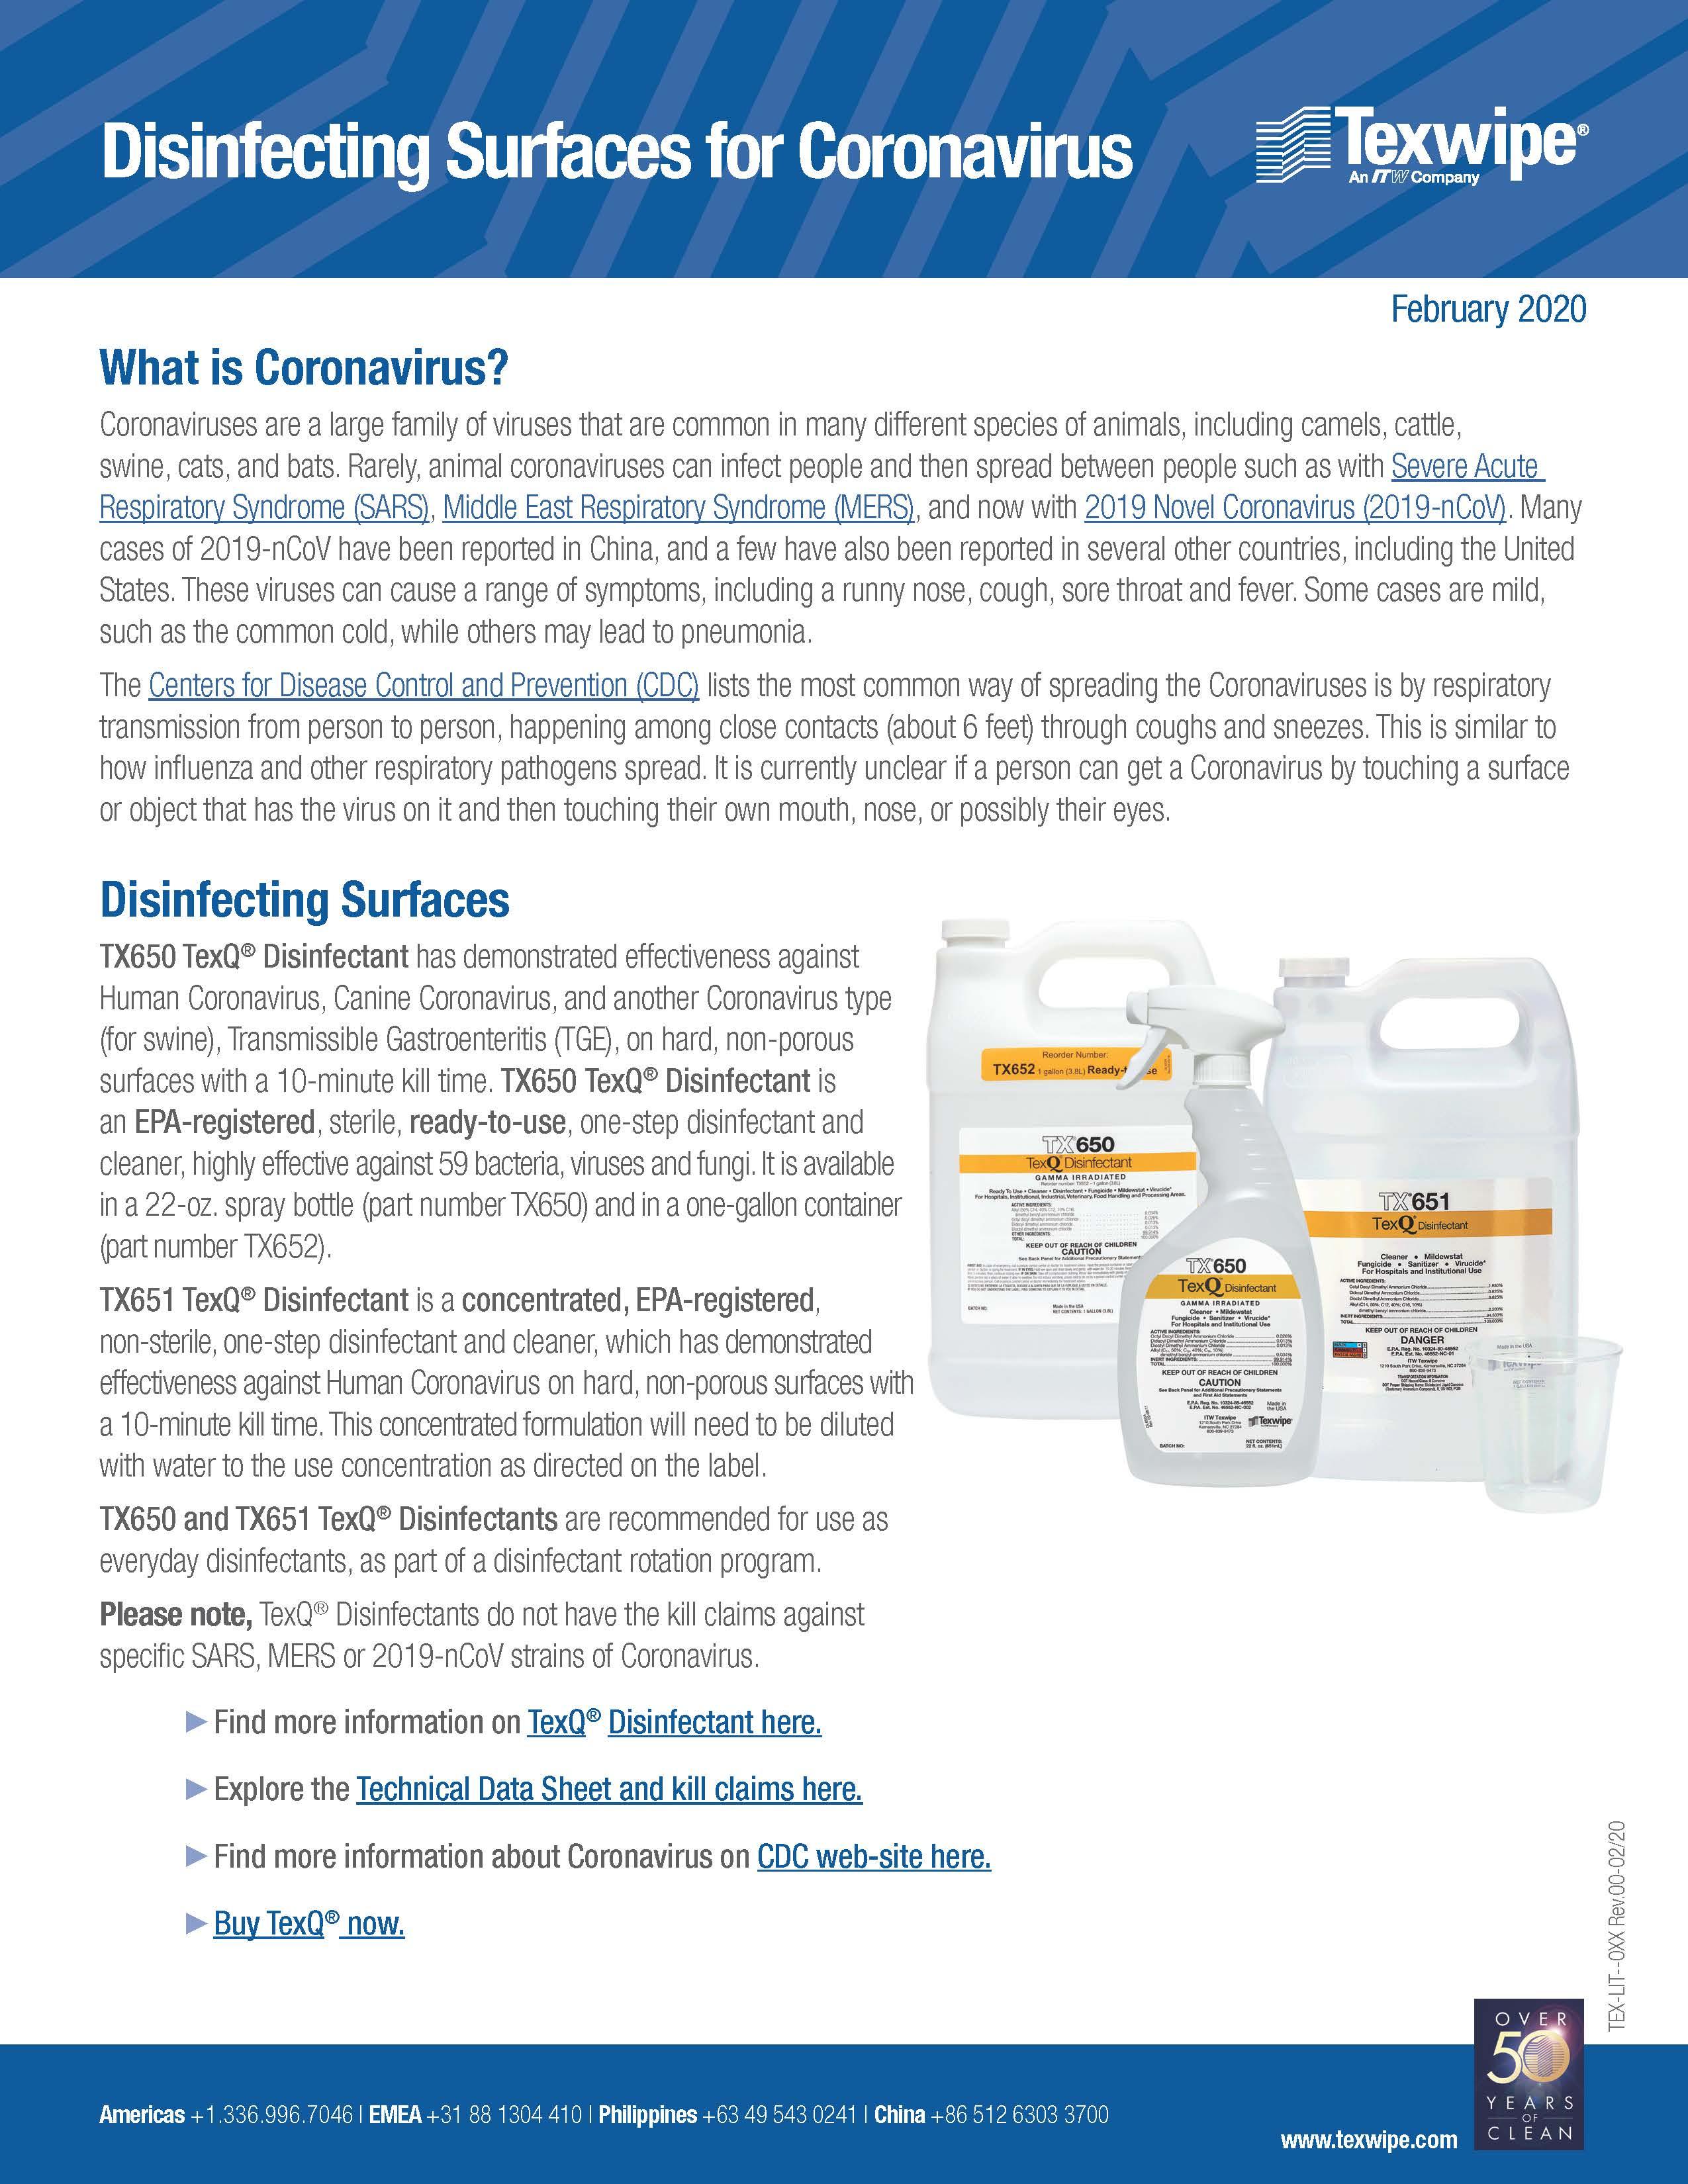 Disinfecting Surfaces for Coronavirus.jpg